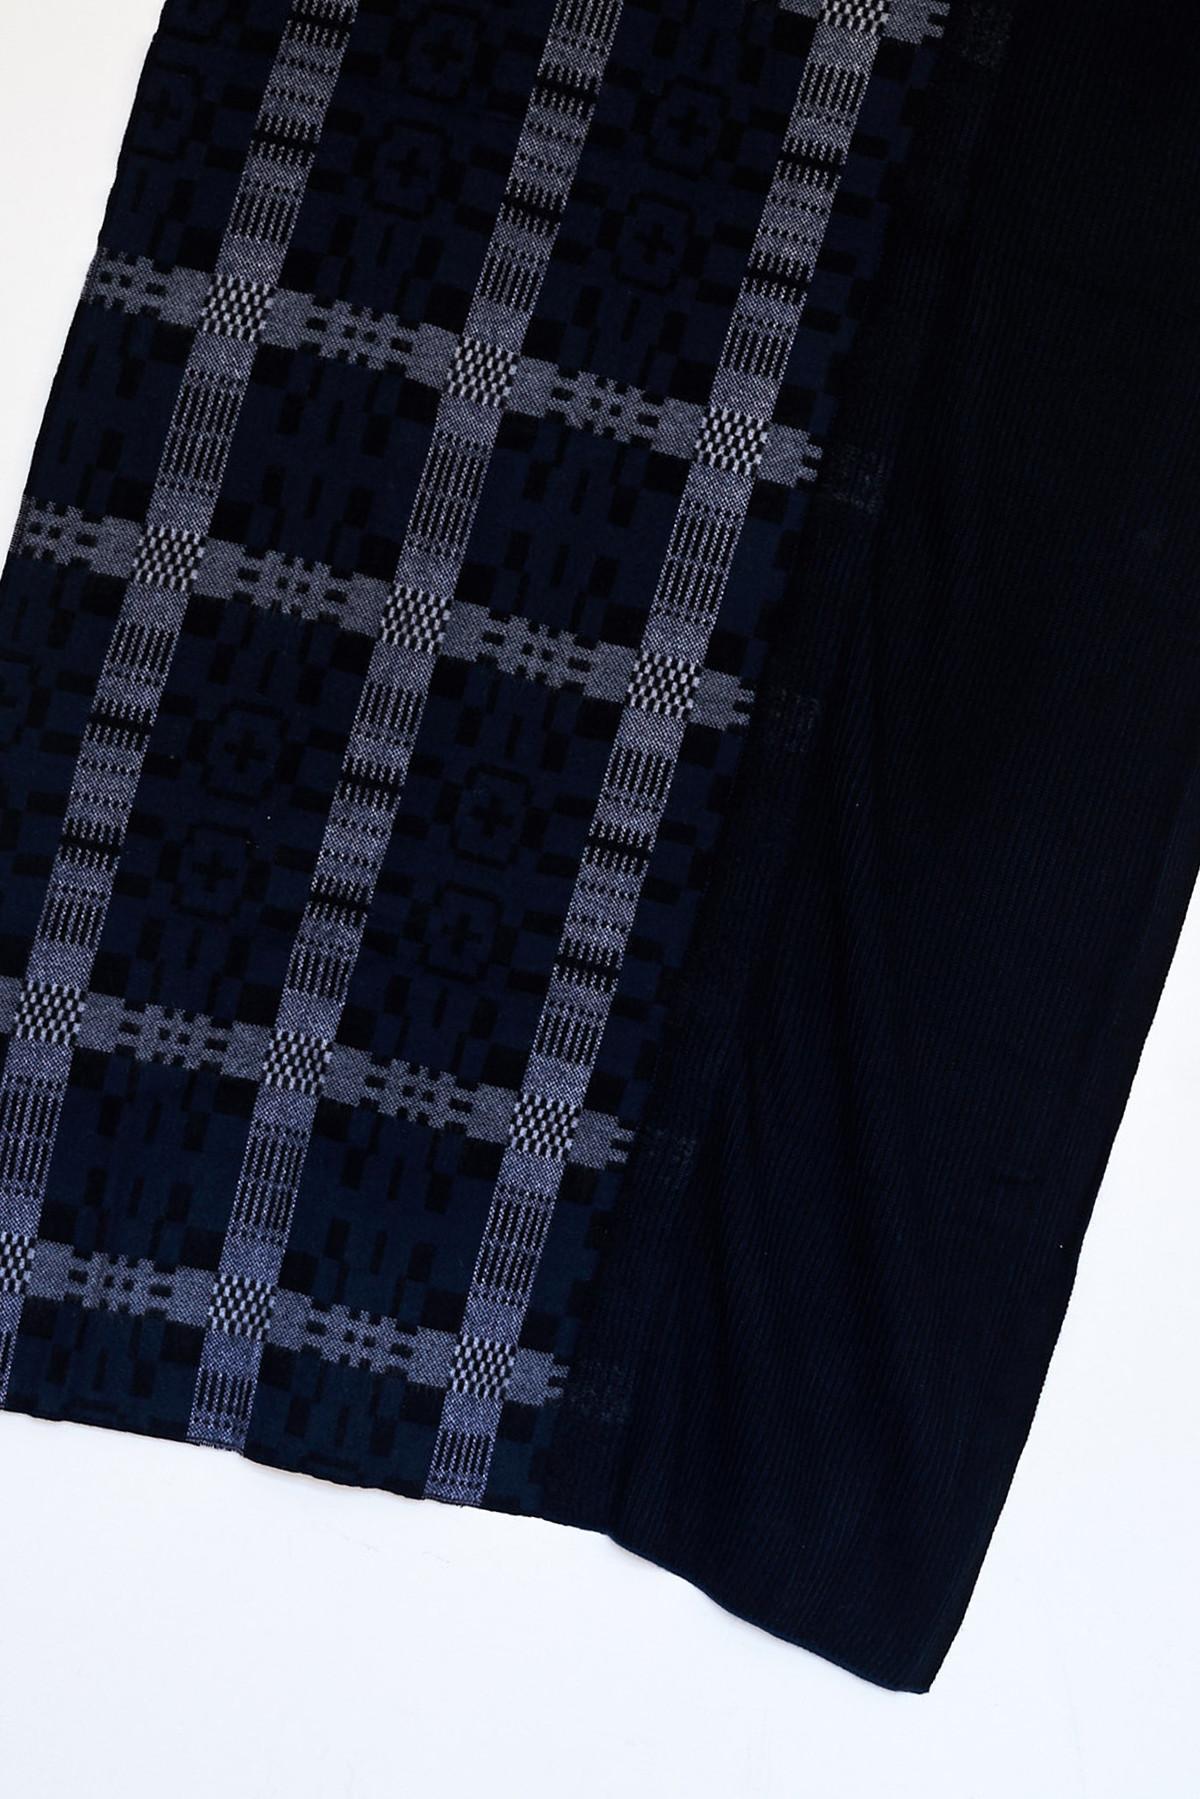 Standard Form Wool/Cashmere Danish Large Scarf | Garmentory